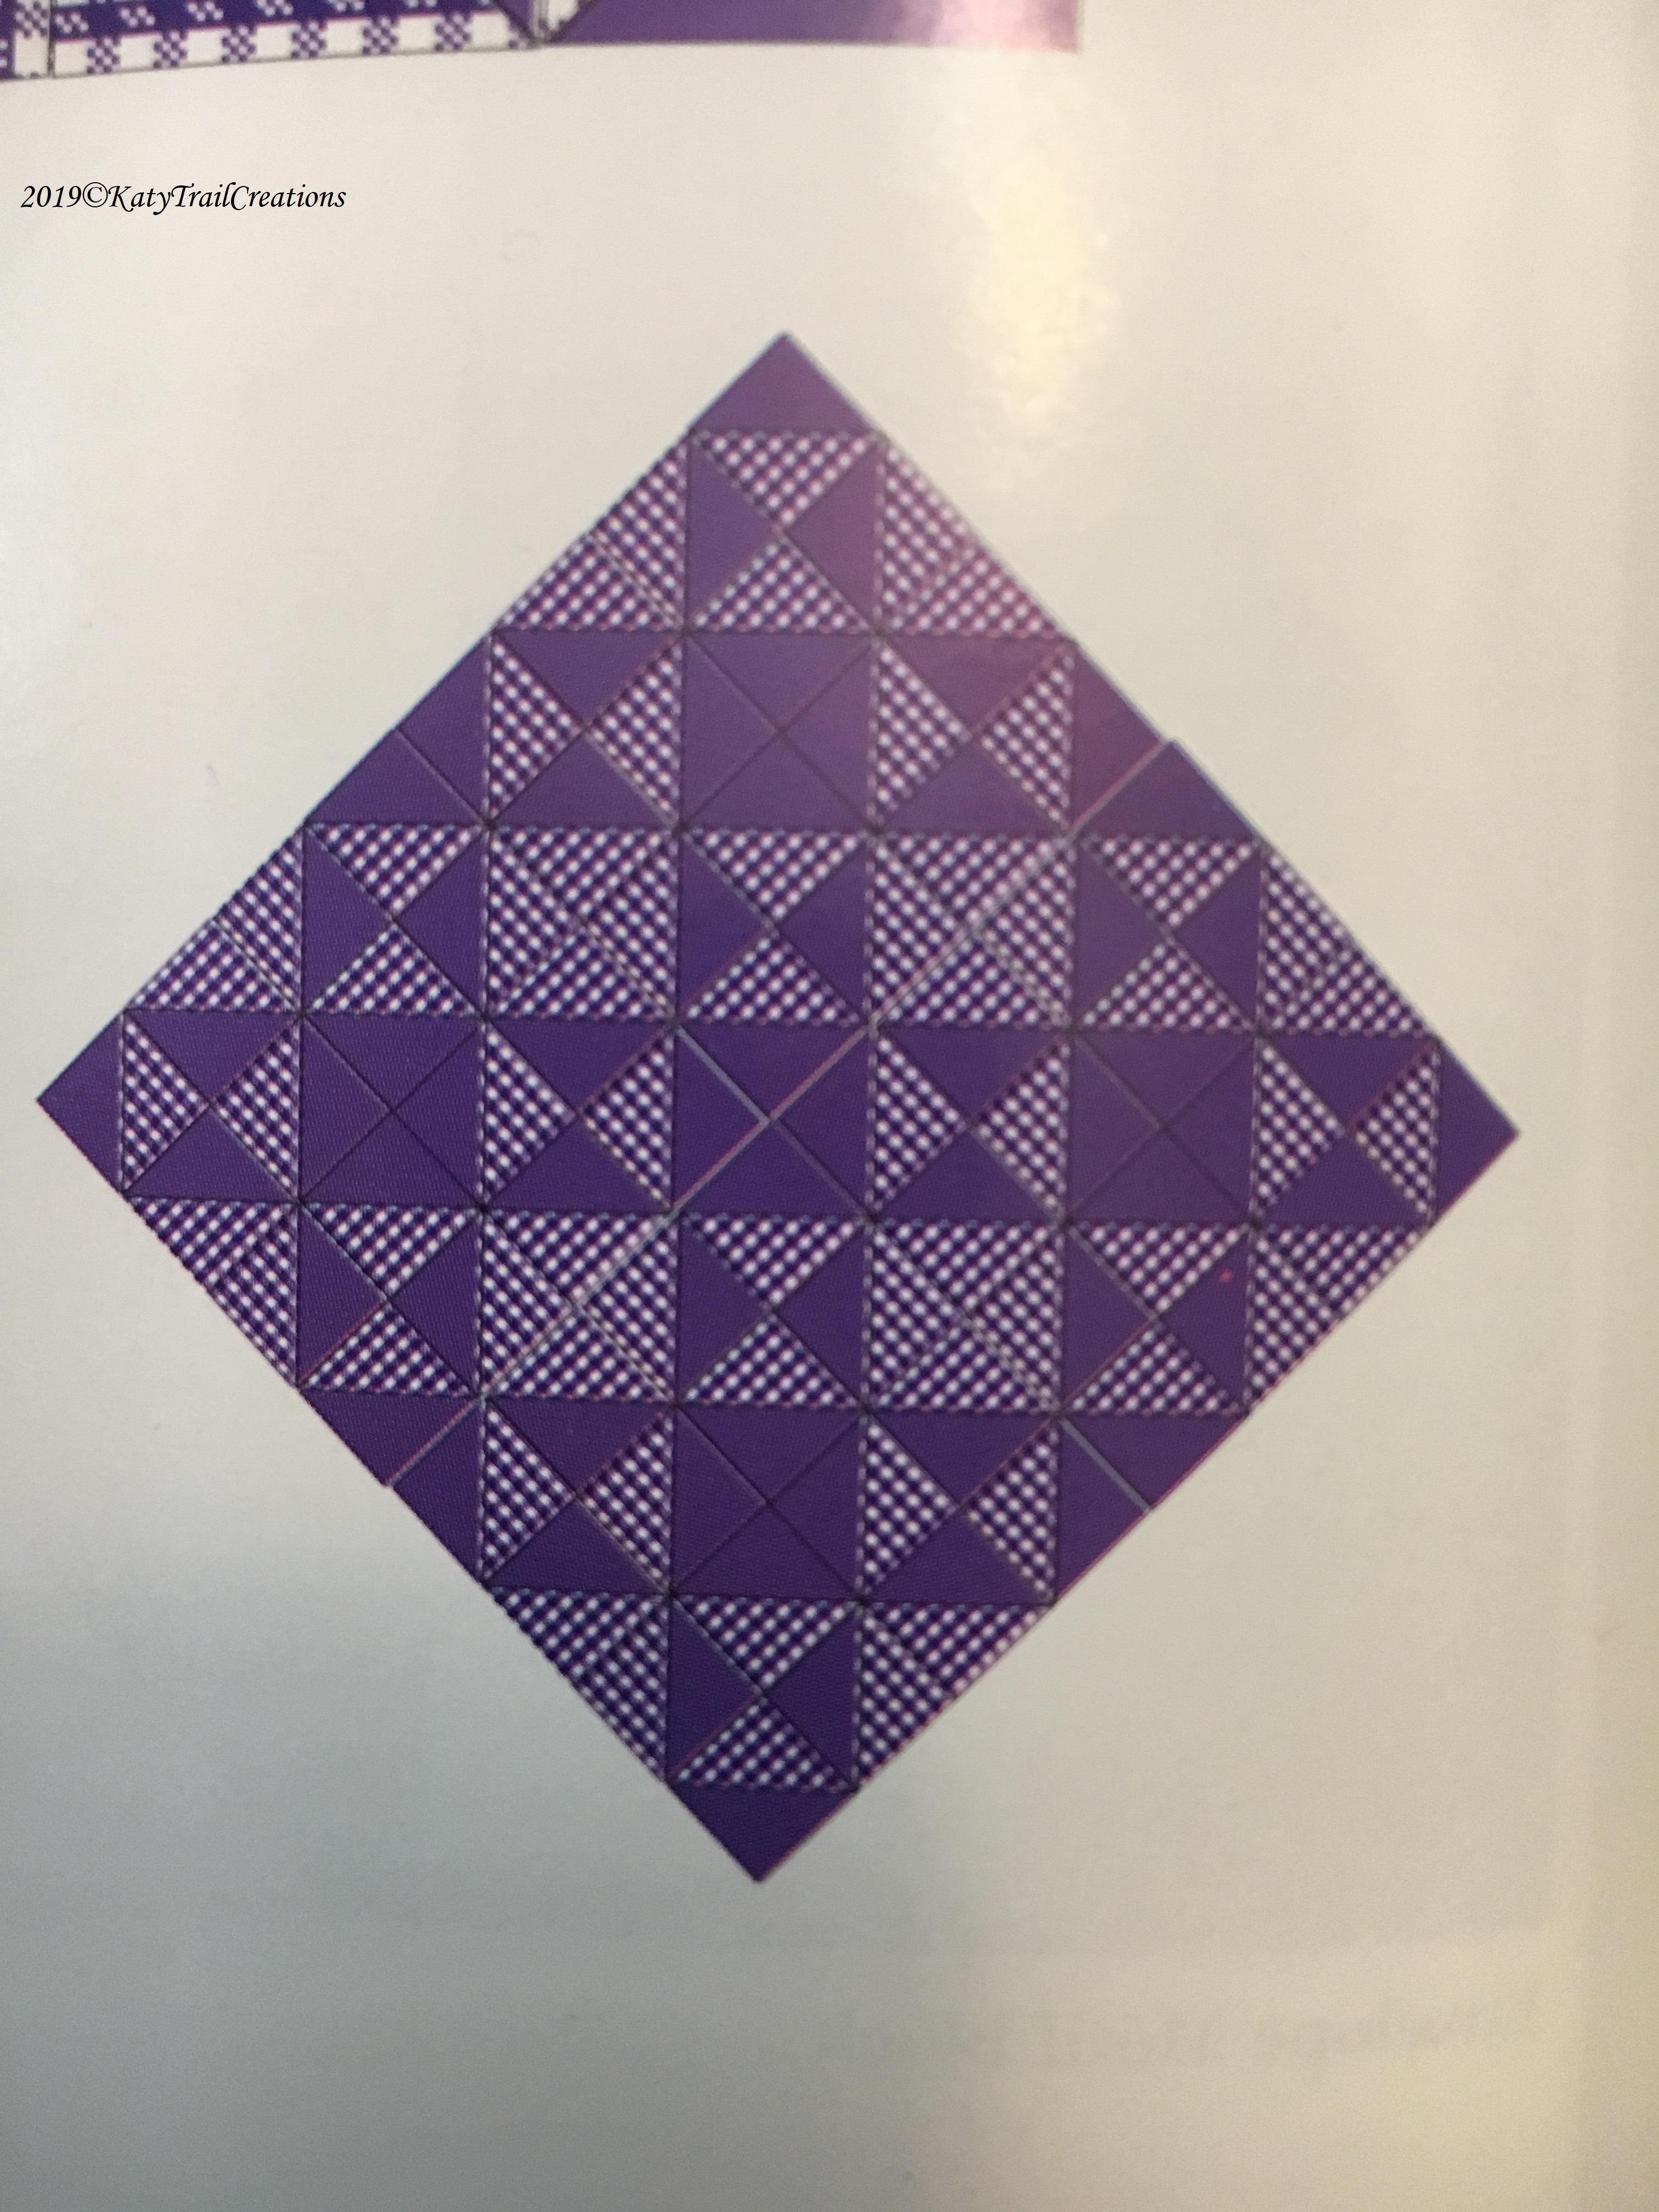 On point layout of Envelope blocks